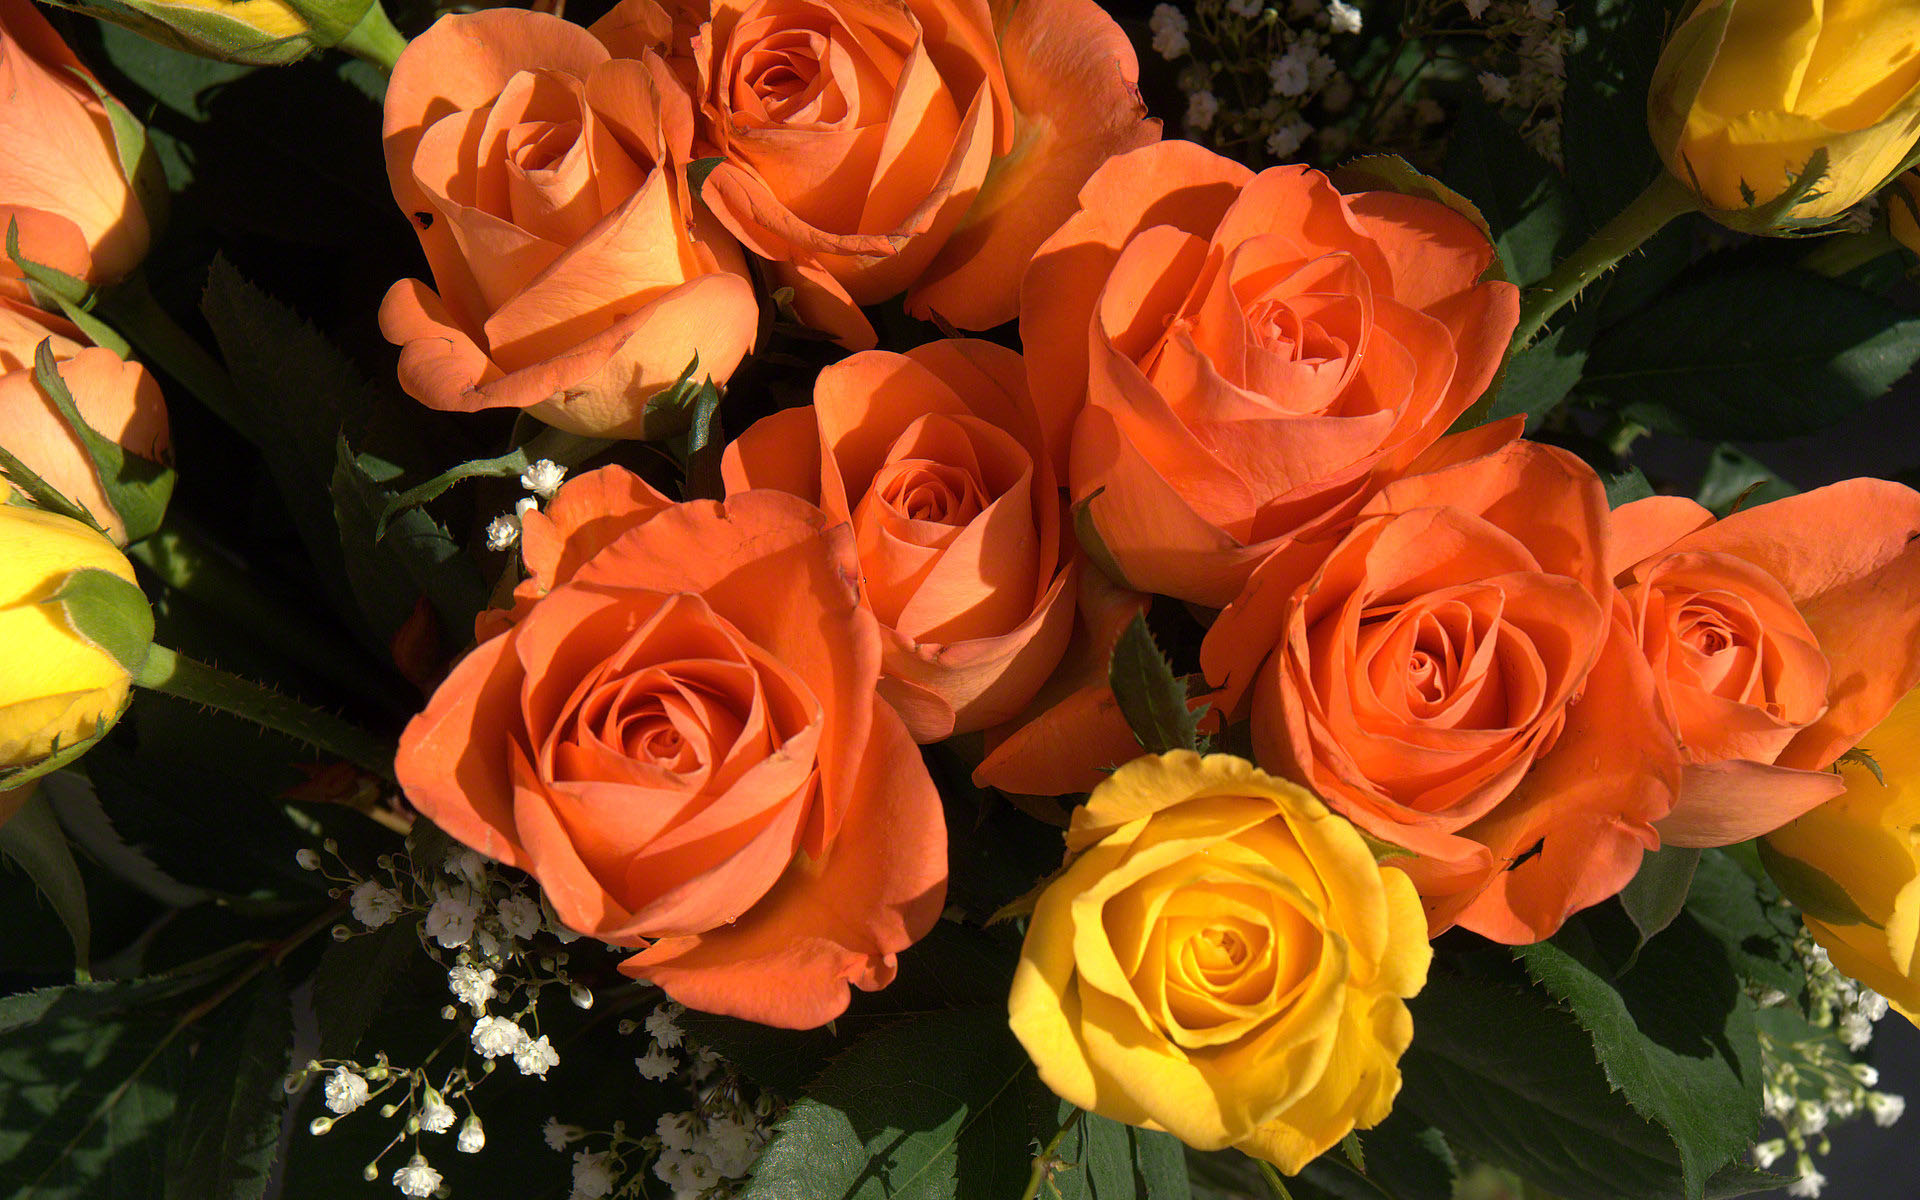 http://www.fabiovisentin.com/photography/photo/12/roses-photo-wallpaper-02644.jpg